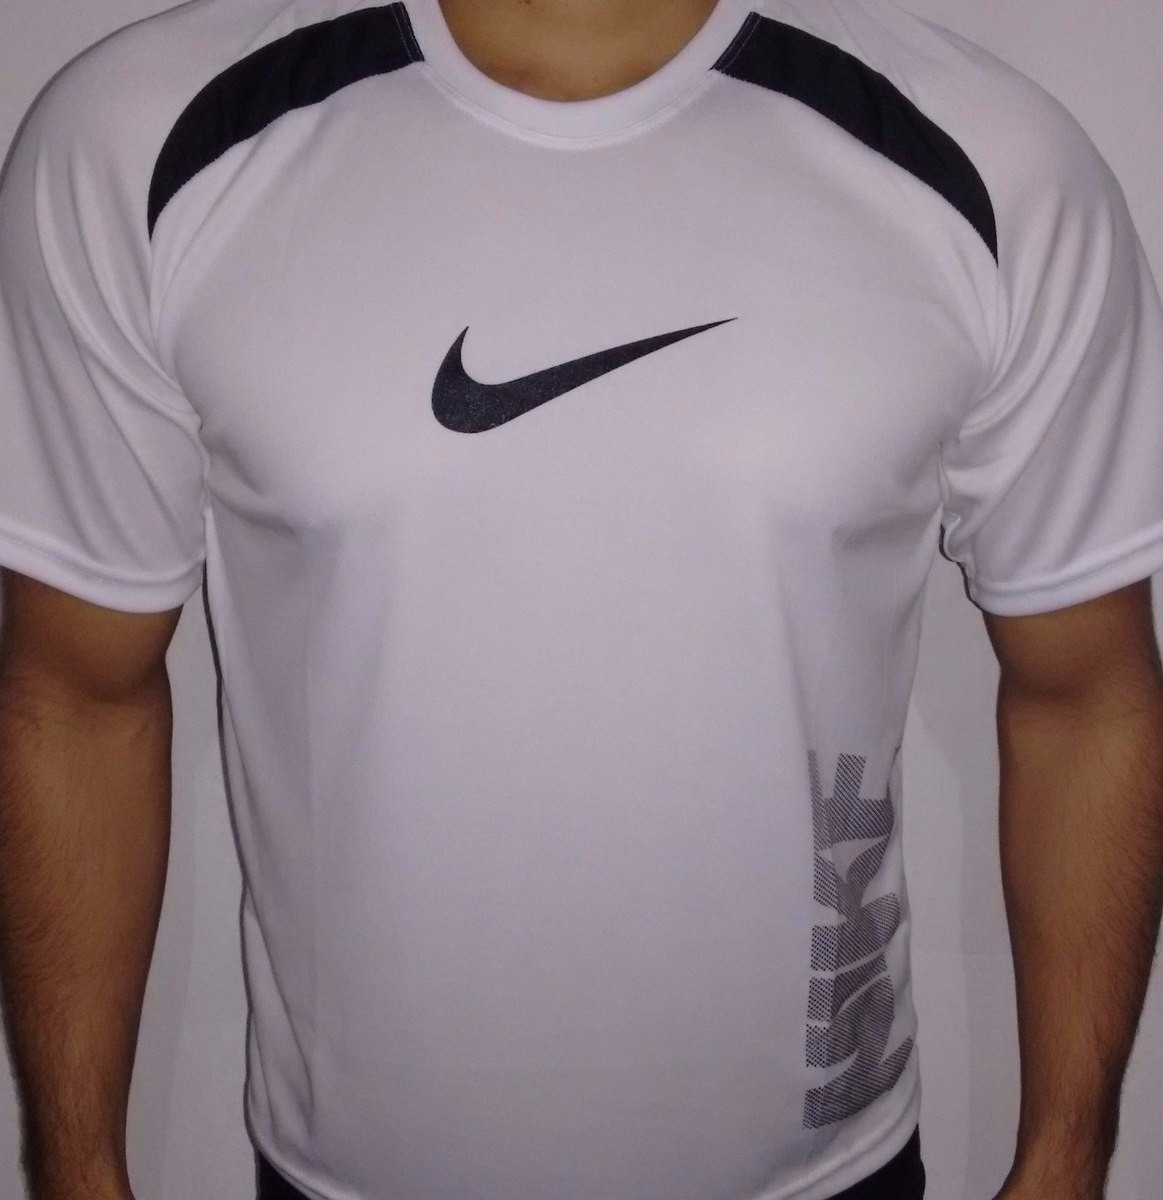 91455e6ca Kit 10 Camisetas Dry Fit Poliester Academia Corrida. - R  130